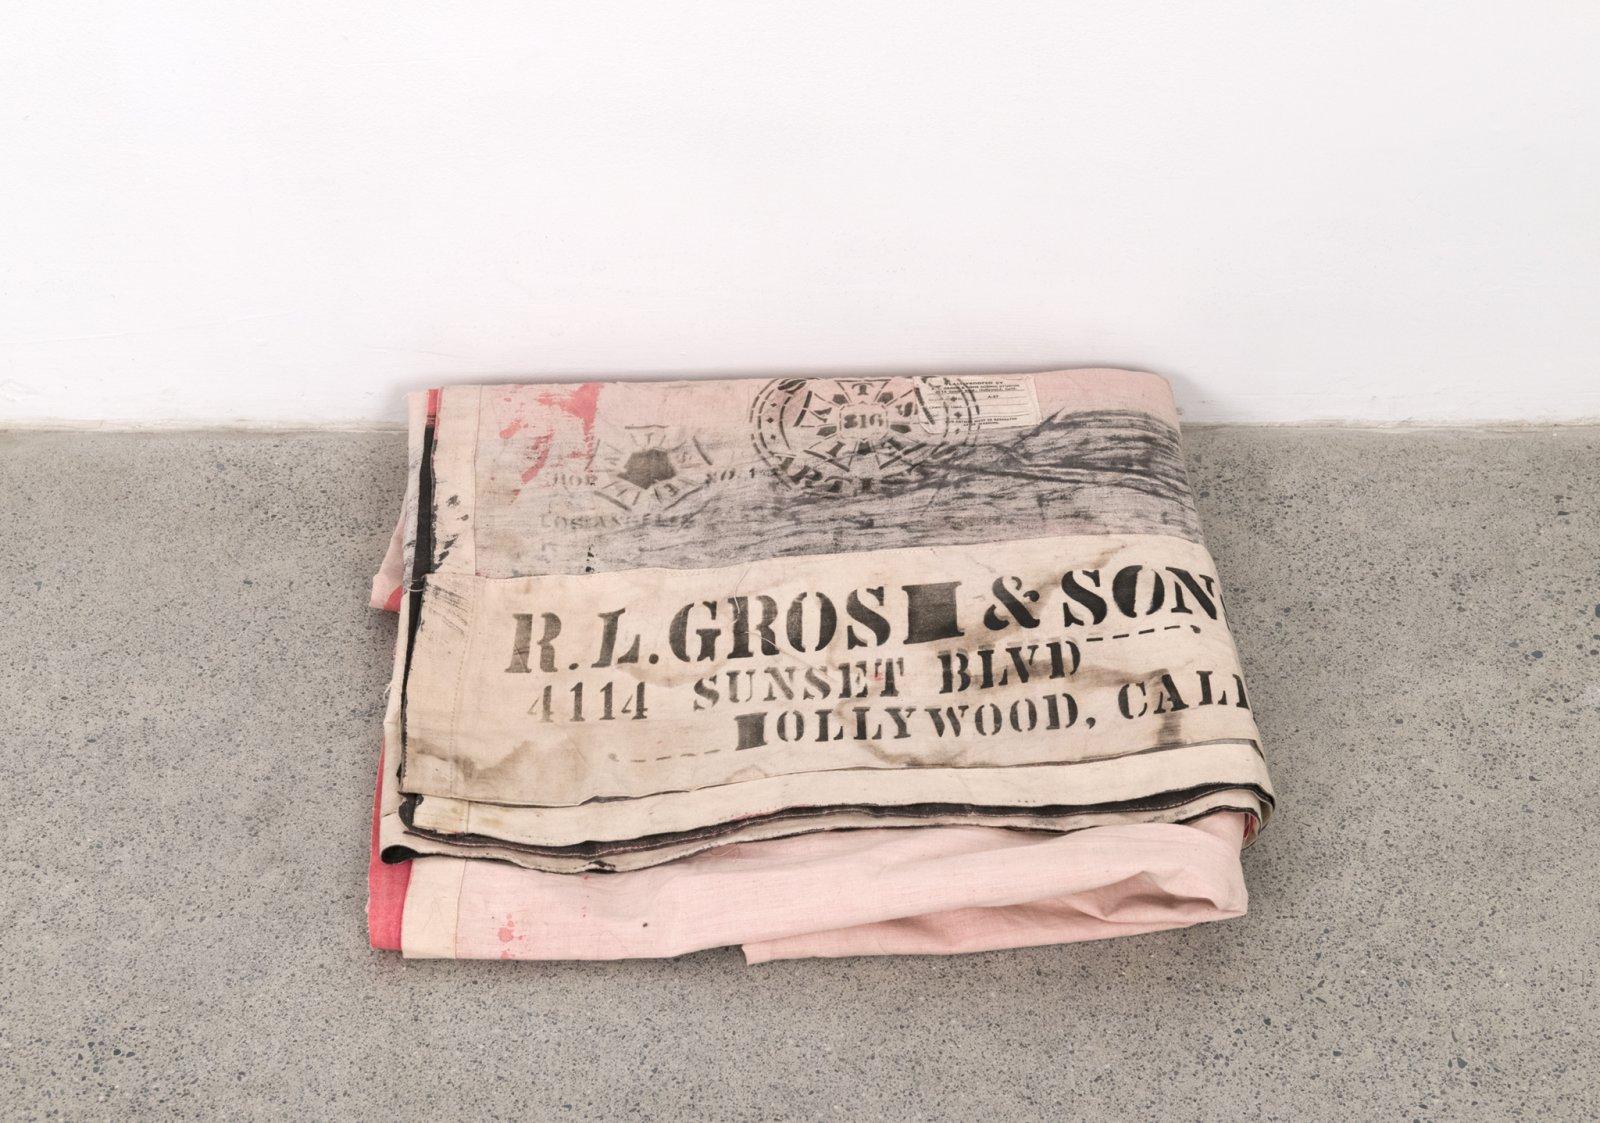 Geoffrey Farmer, THE BIG KITCHEN OF MY CHILDHOOD, 2017, ink on paper, theatre backdrop (1939), folded backdrop: 3 x 18 x 18 in. (8 x 46 x 46 cm) by Geoffrey Farmer